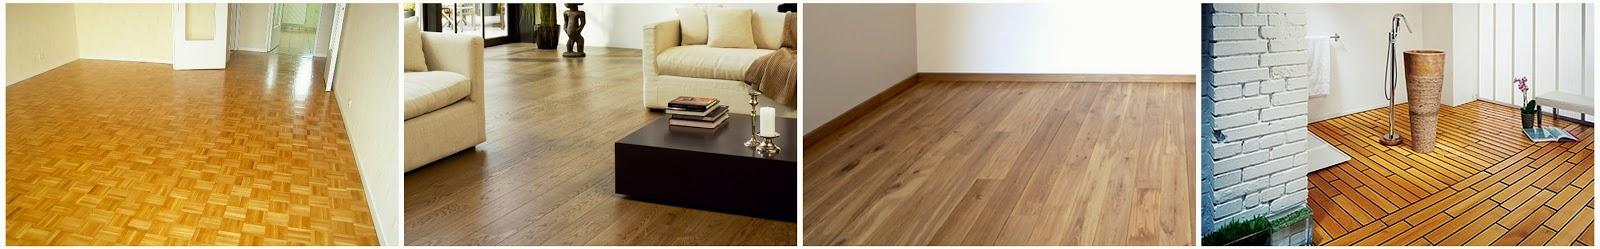 rev tement de sol paris l 39 artisan peintre lehmanerenove. Black Bedroom Furniture Sets. Home Design Ideas